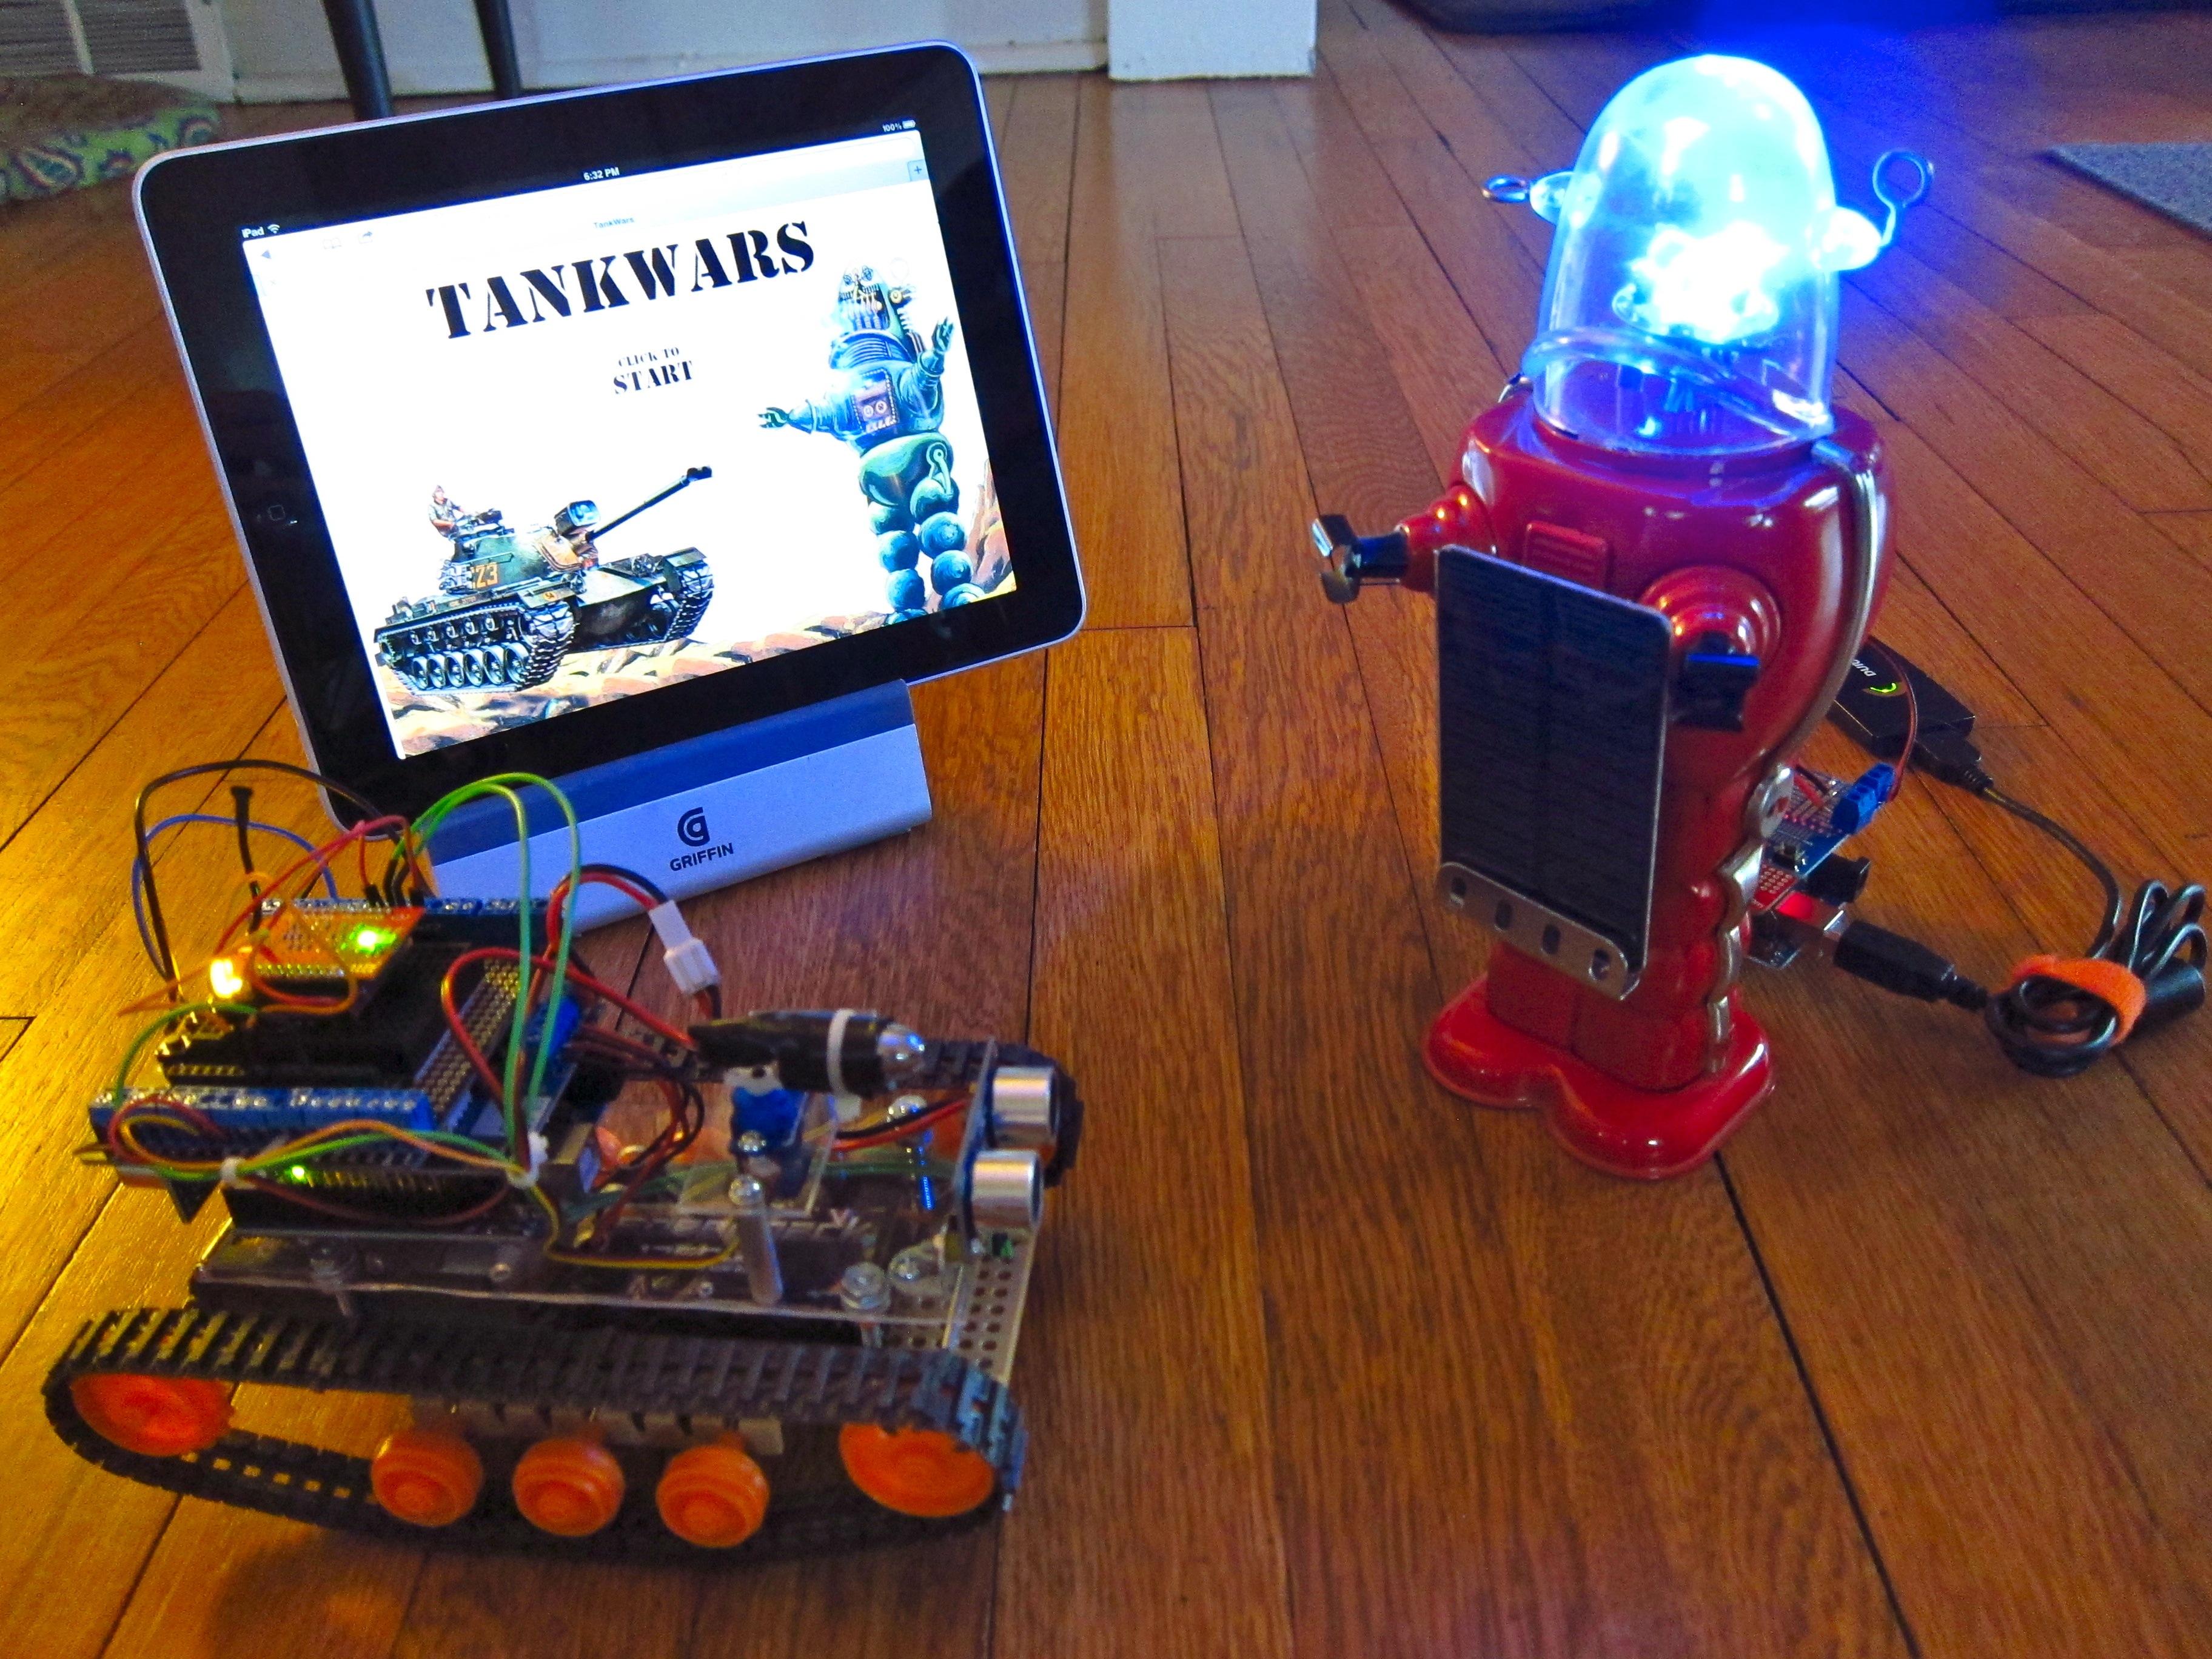 TankWars: A Physical Video Game